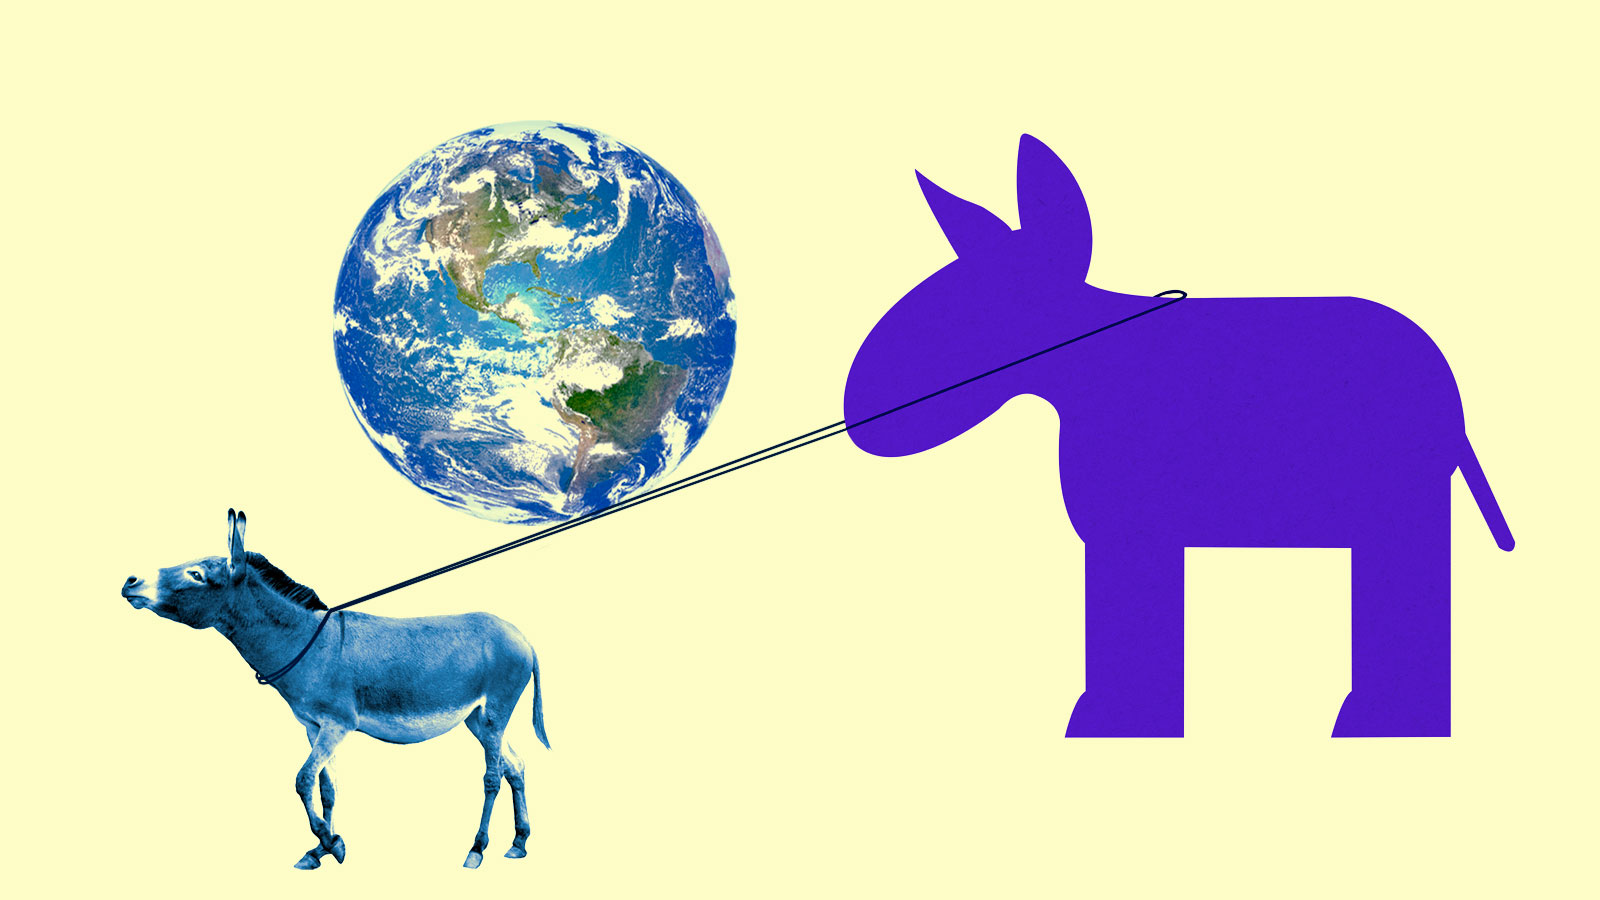 Donkey pulling larger donkey with Earth balanced on ropes between them